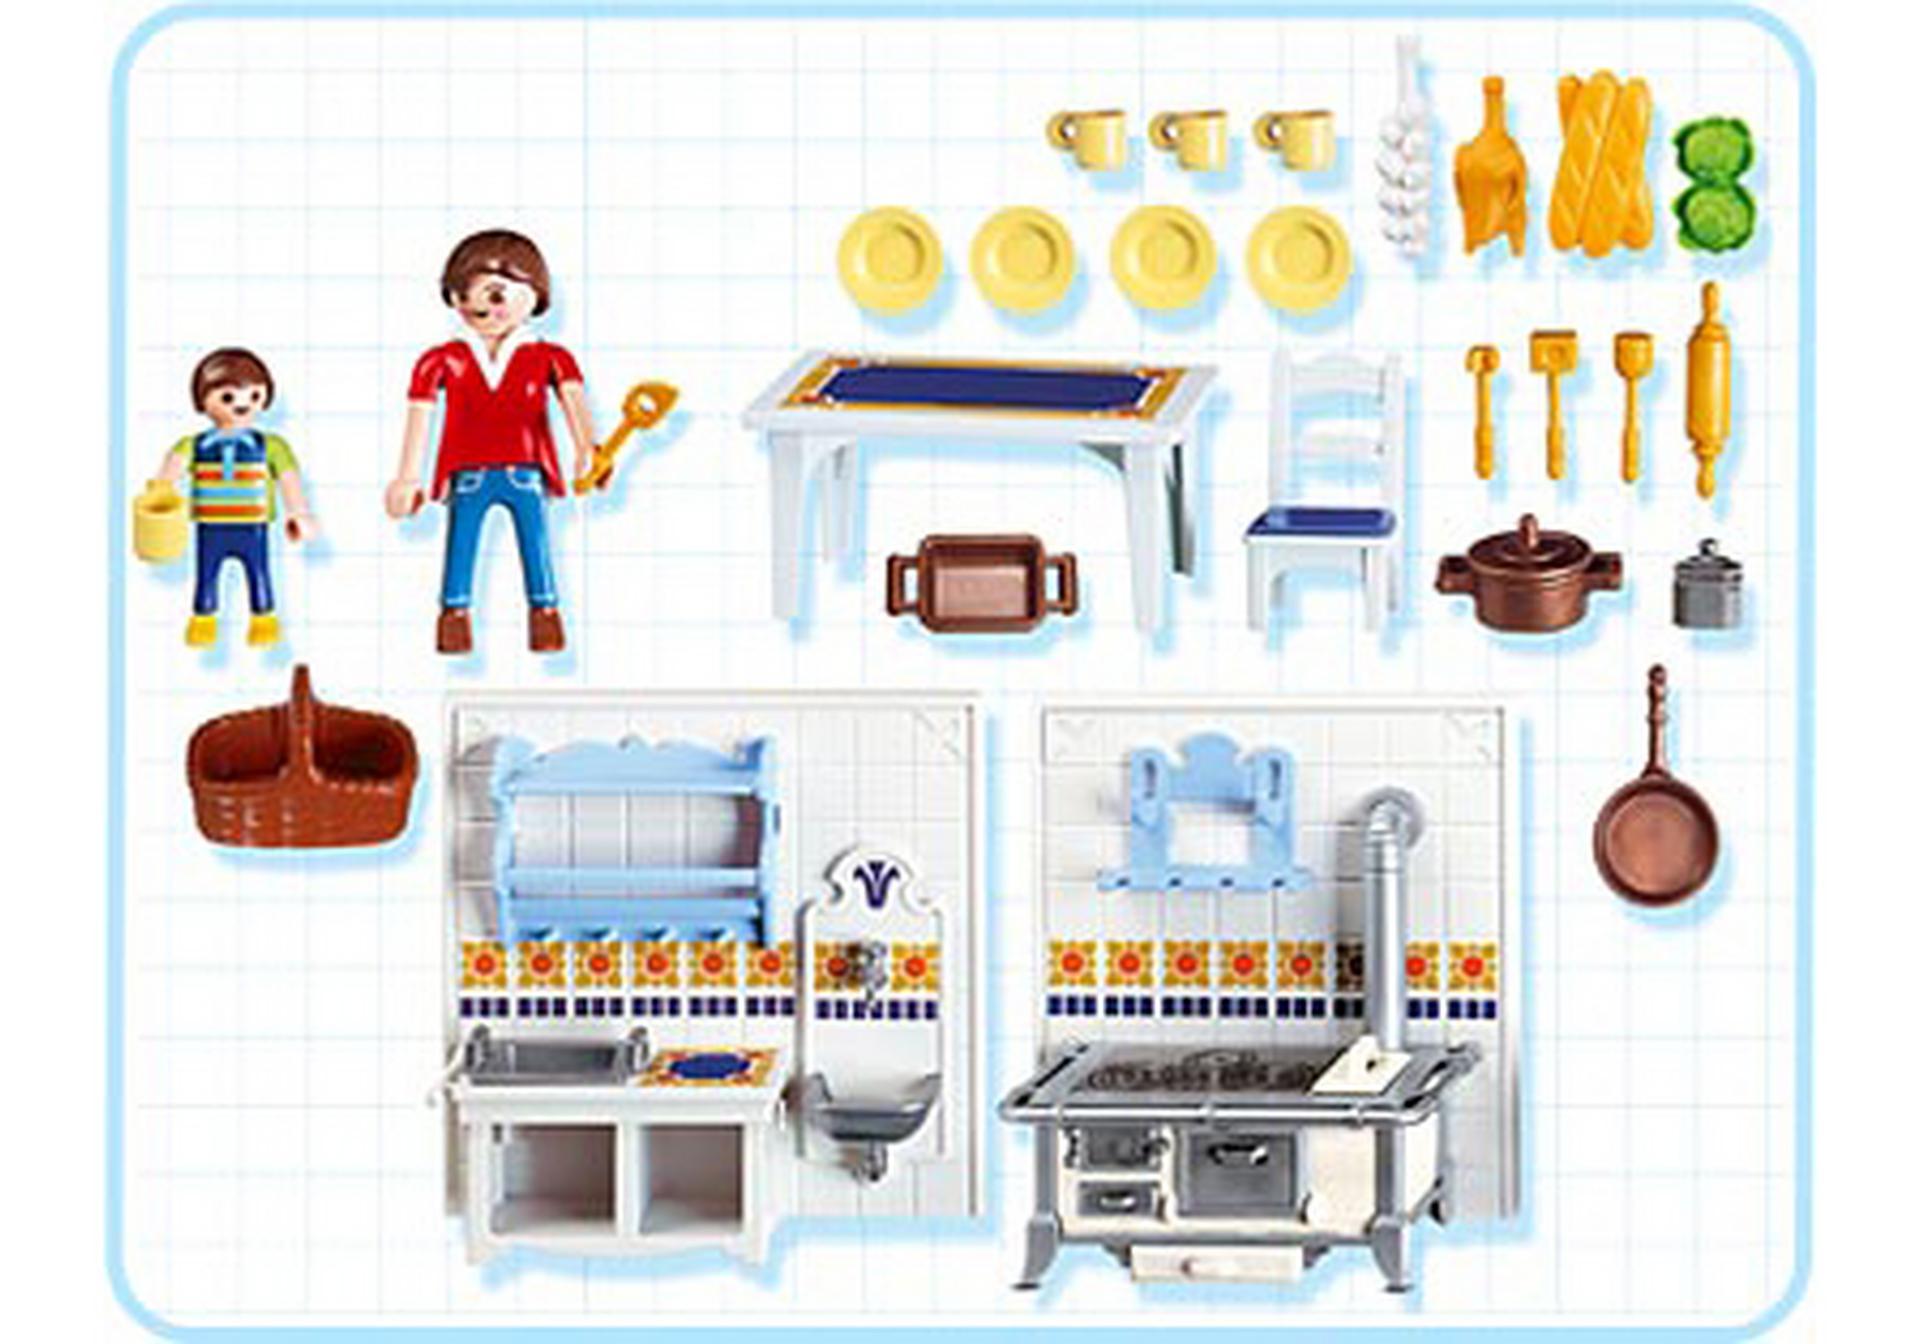 playmobil k che 5336 thermometer k che spritzschutz selbstklebend eckschrank ikea. Black Bedroom Furniture Sets. Home Design Ideas